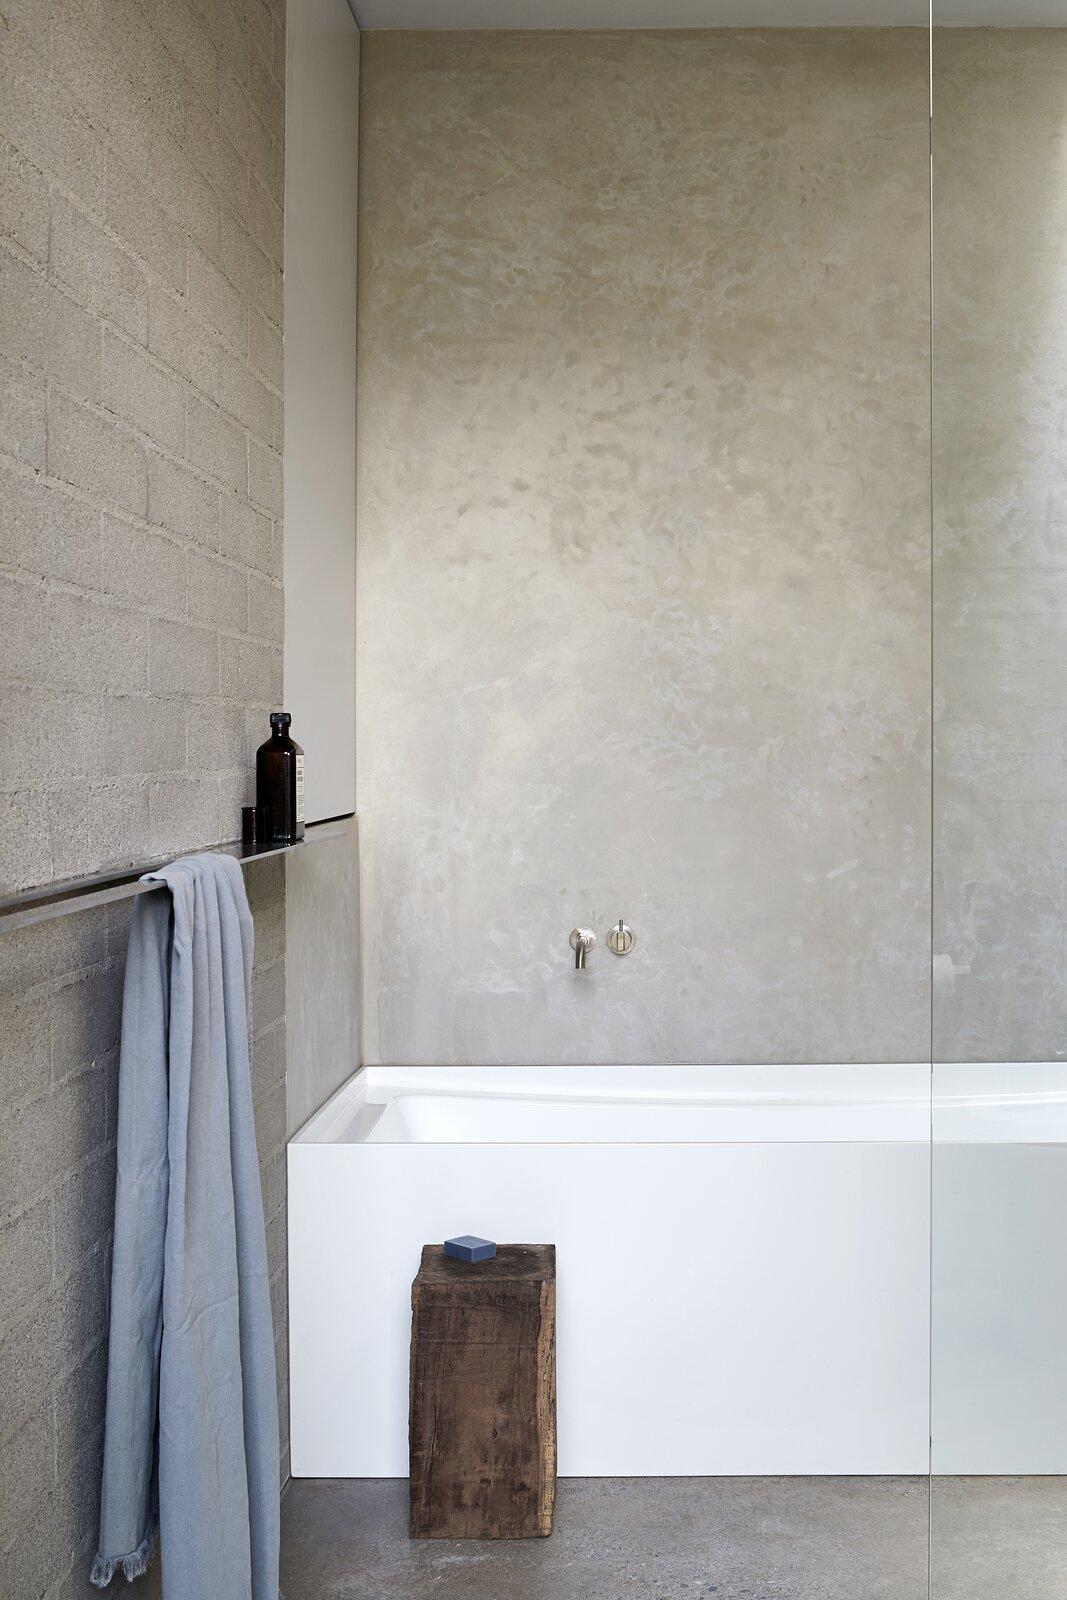 Bath, Alcove, Concrete, and Concrete  Bath Concrete Concrete Photos from Ruxton Rise Residence